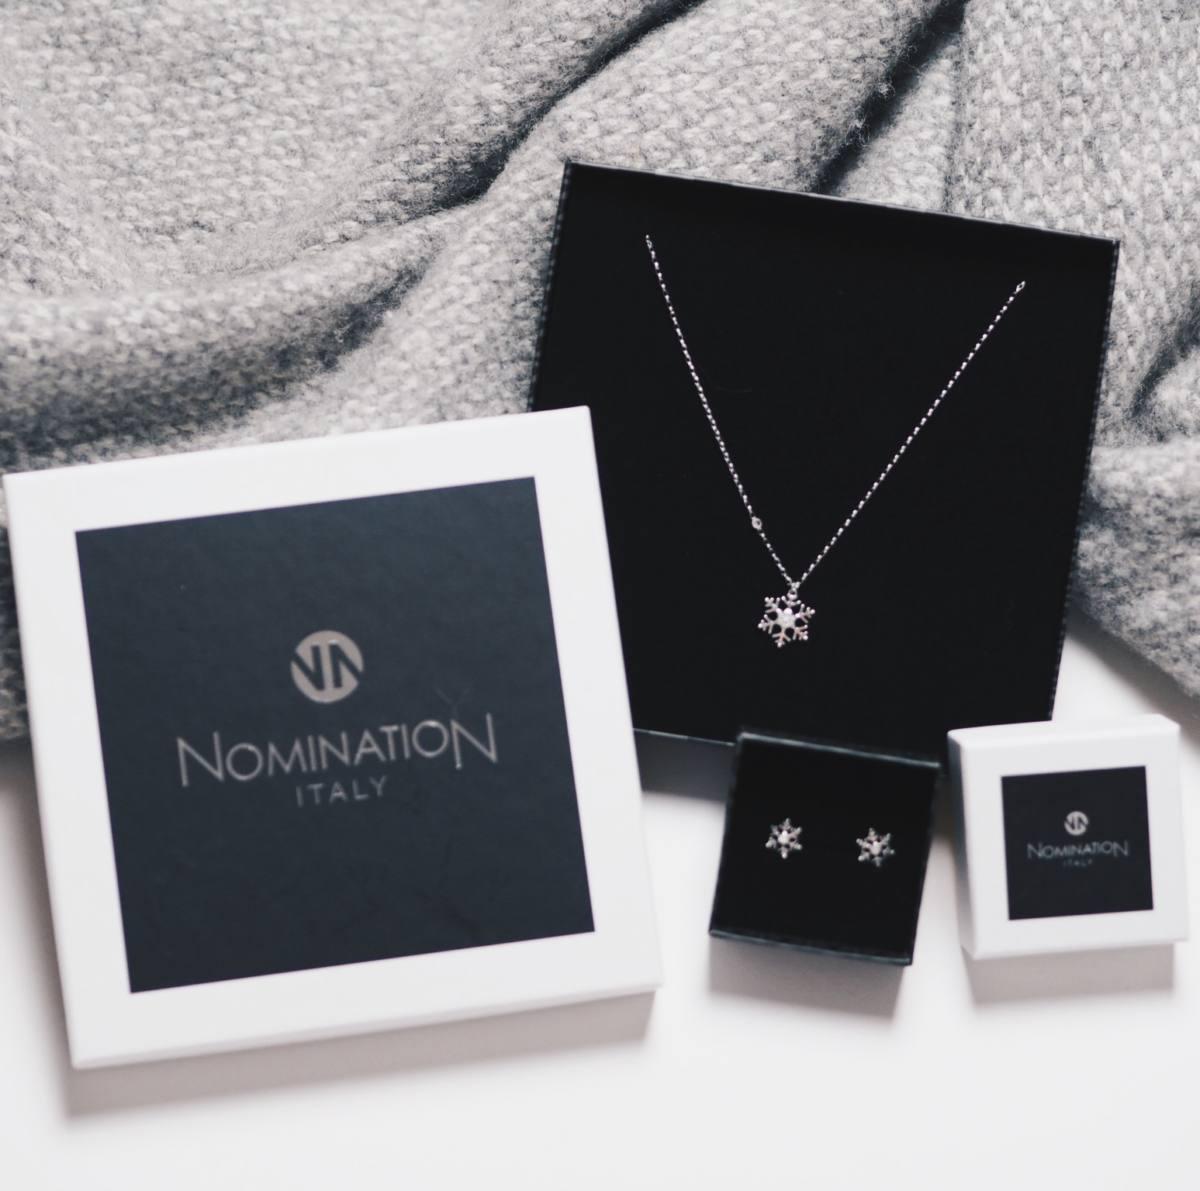 nomination italy christmas gifting